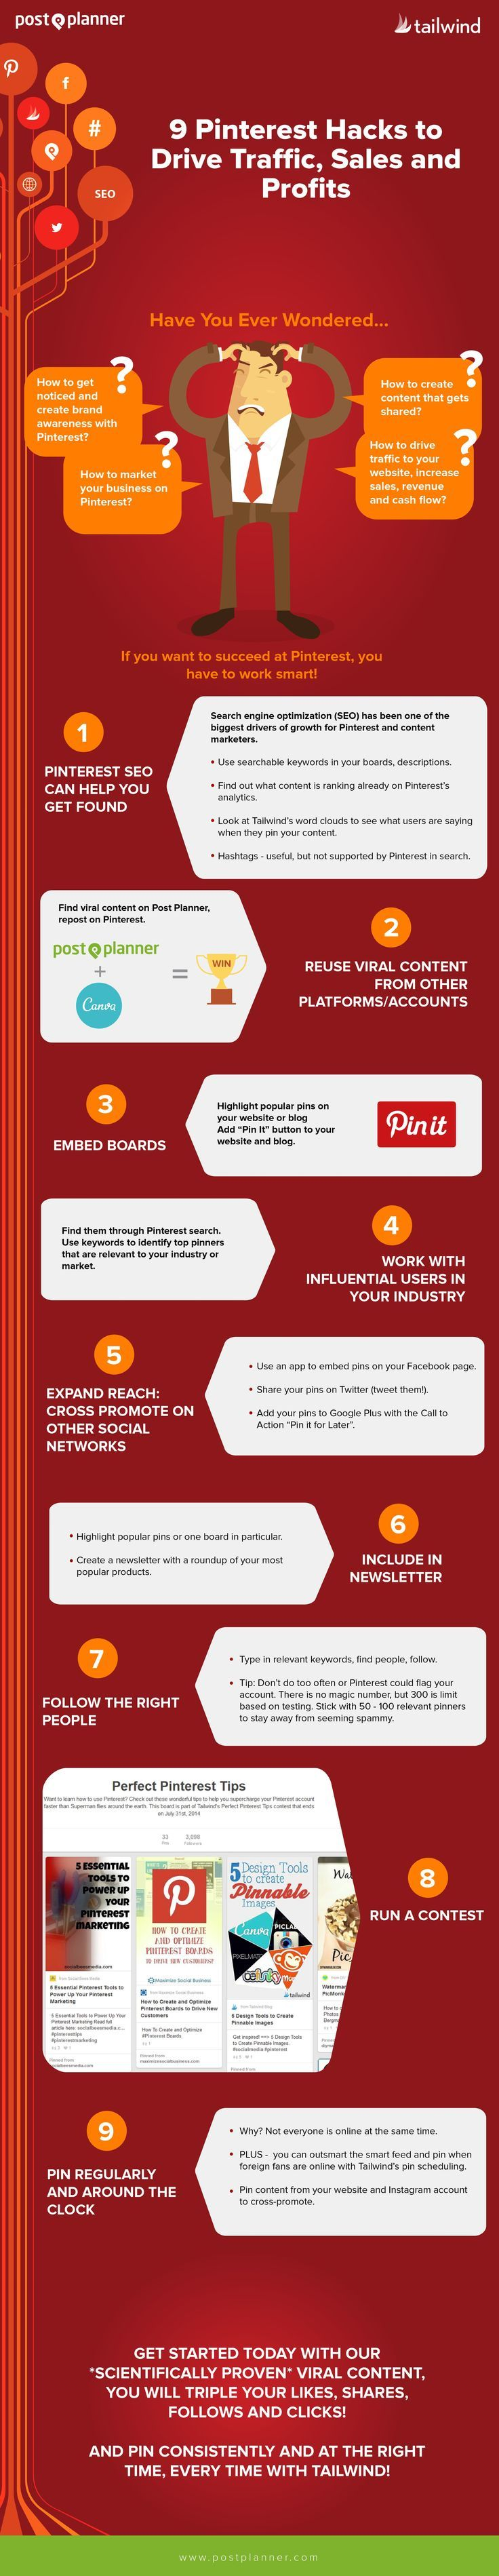 Pinterest Hacks to drive traffic, sales, profits (infographic)